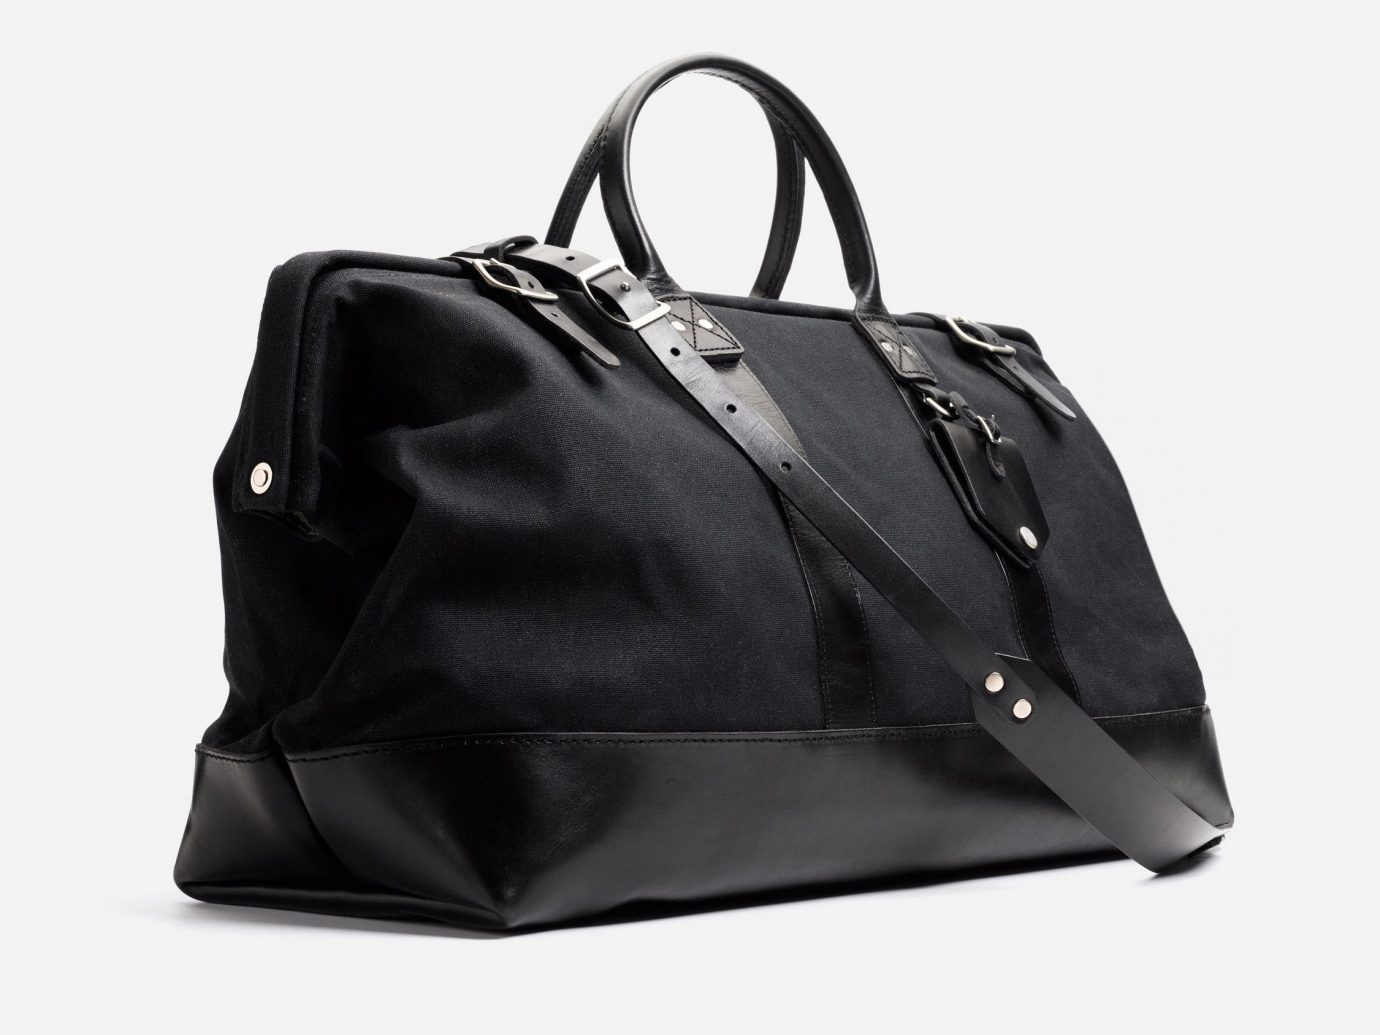 Style + Design bag black handbag accessory leather product shoulder bag hand luggage baggage luggage & bags product design brand case